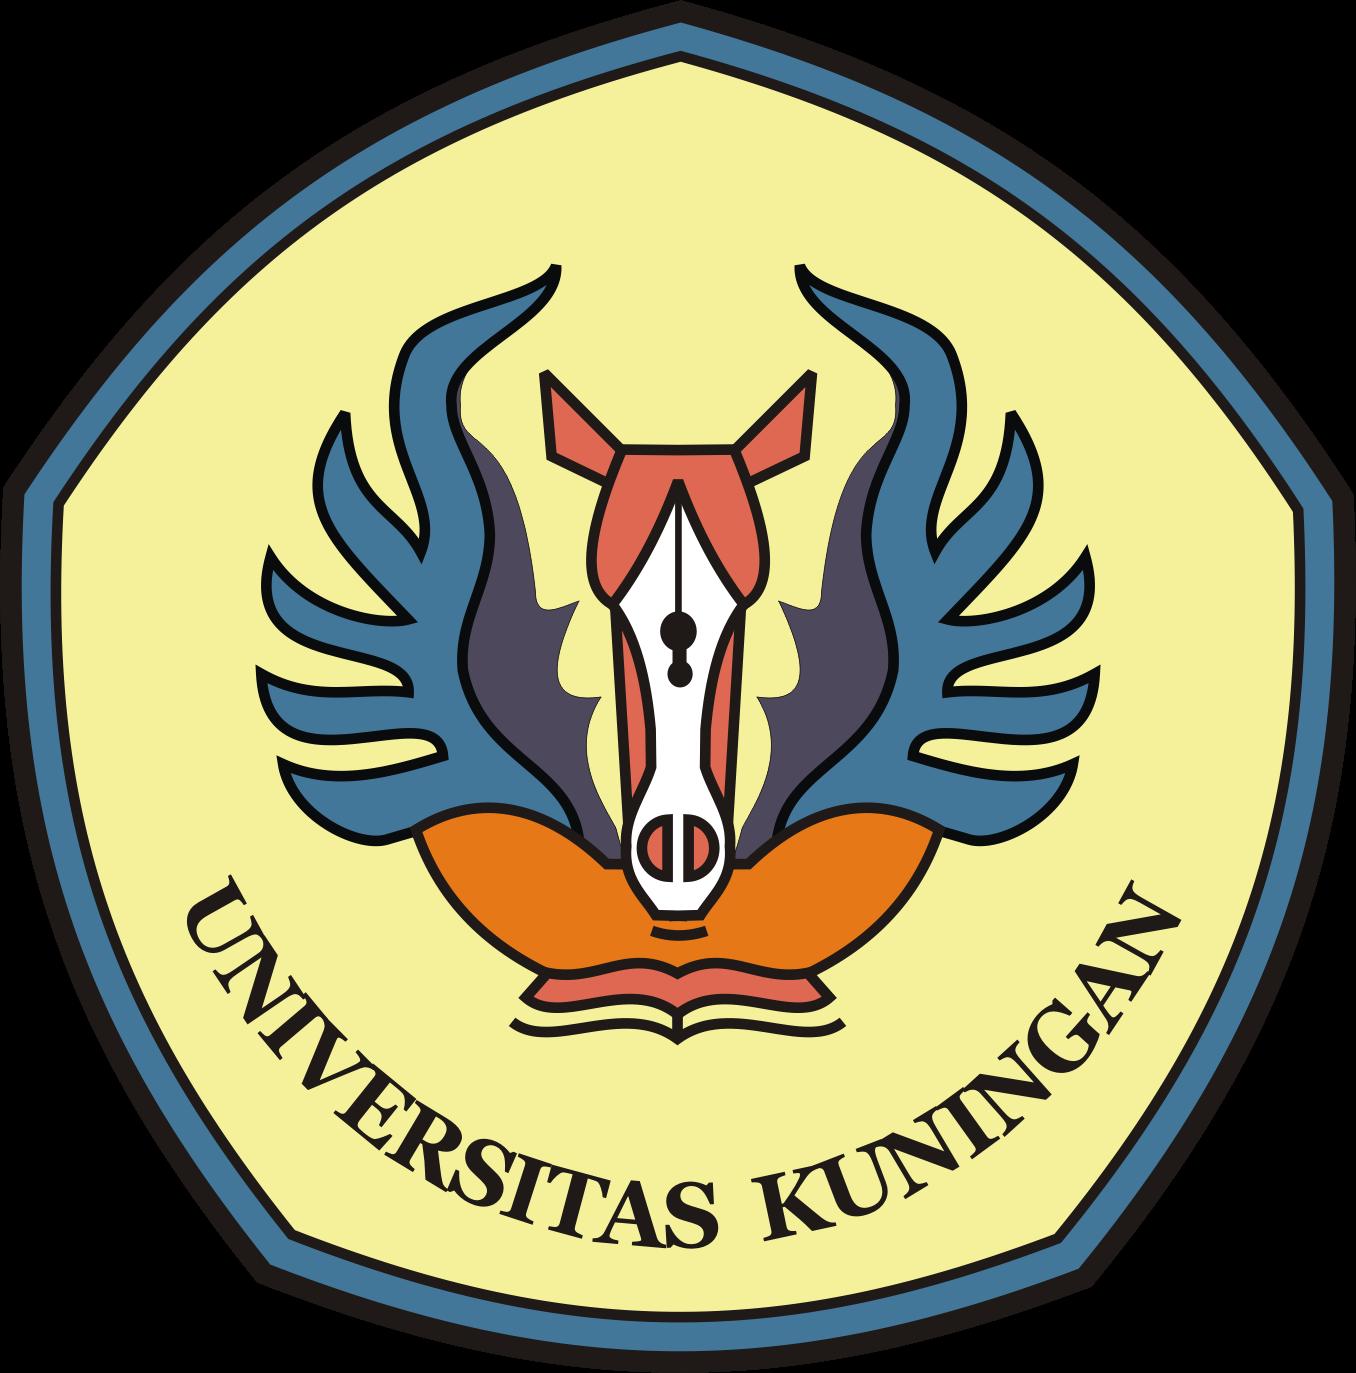 Logo Karang Taruna Png Taruna Gambar Free Download Free Transparent Png Logos